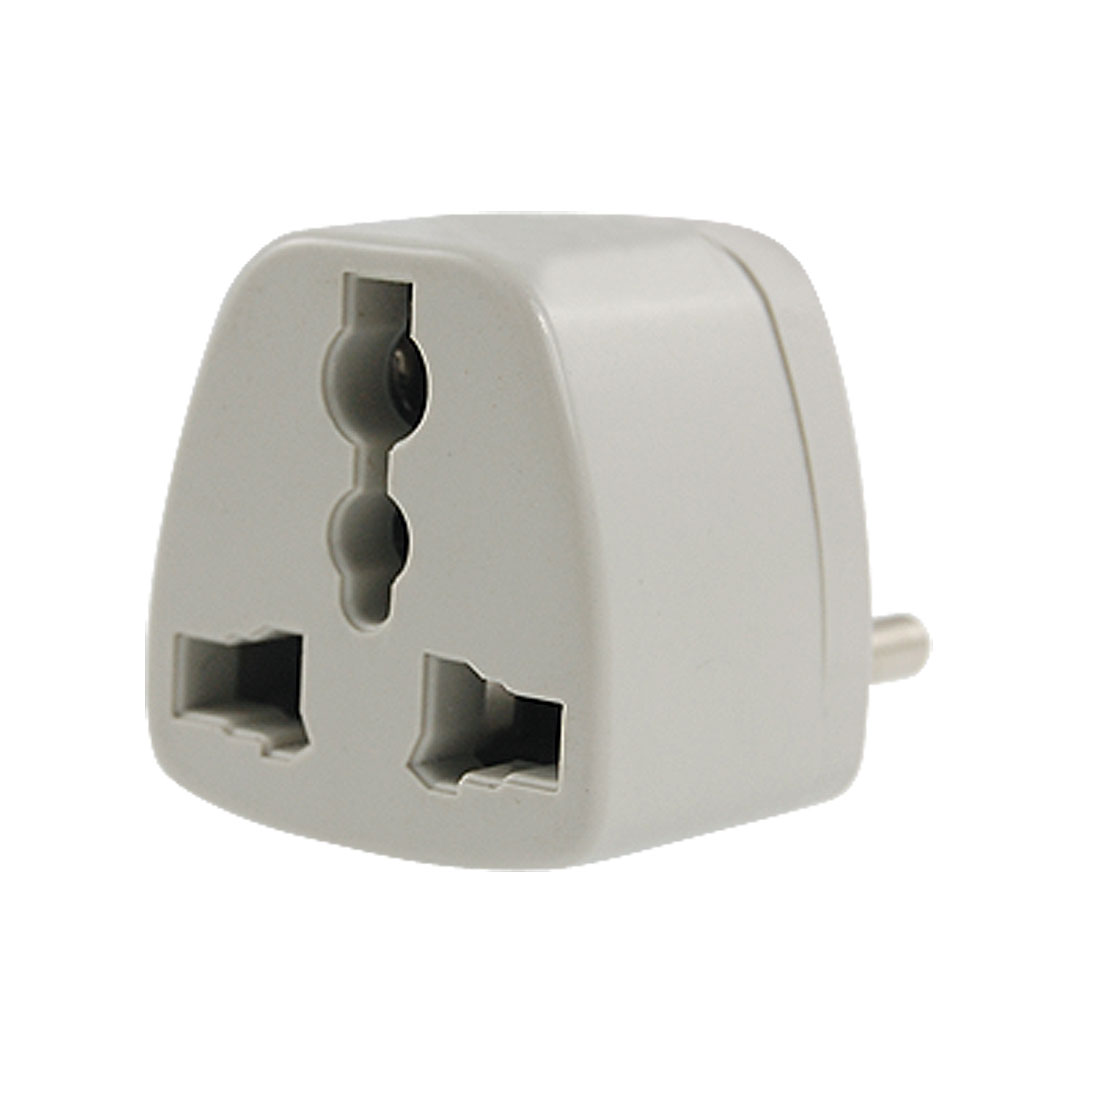 AU US UK Socket to EU Travel Converter AC Power Plug Adapter